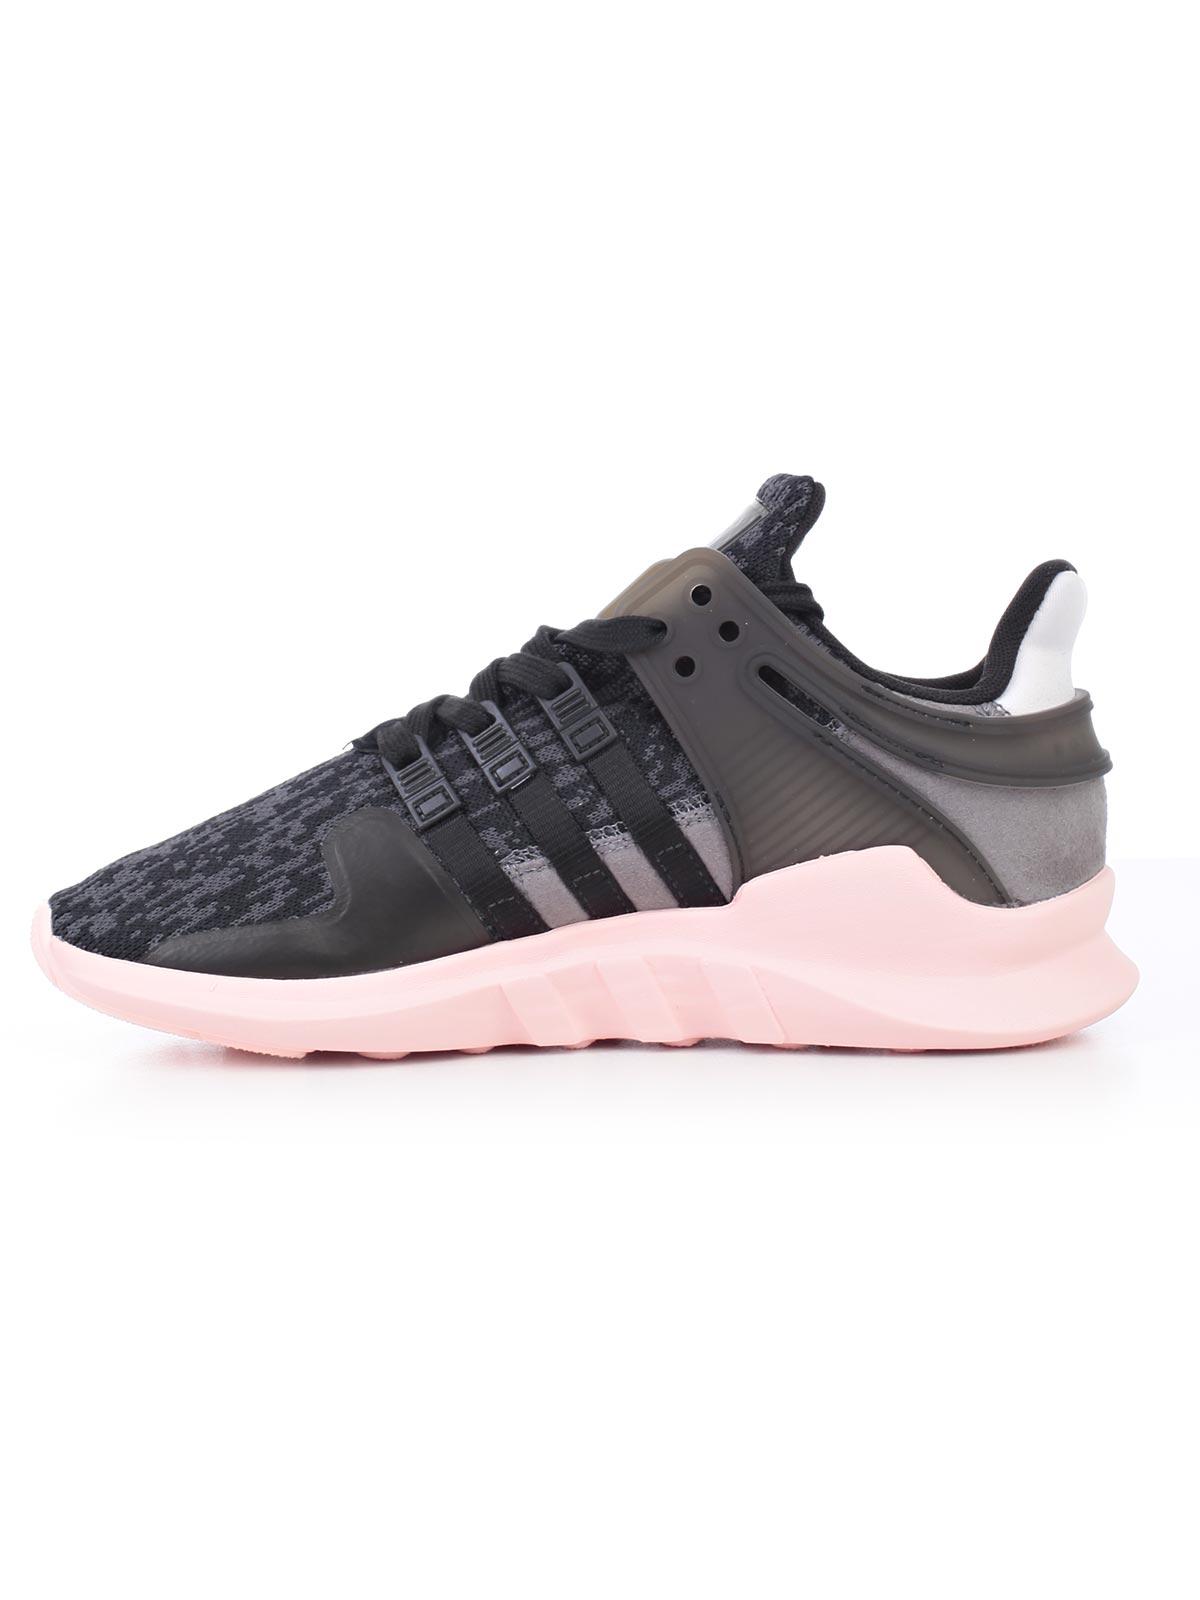 Picture of Adidas Originals Footwear